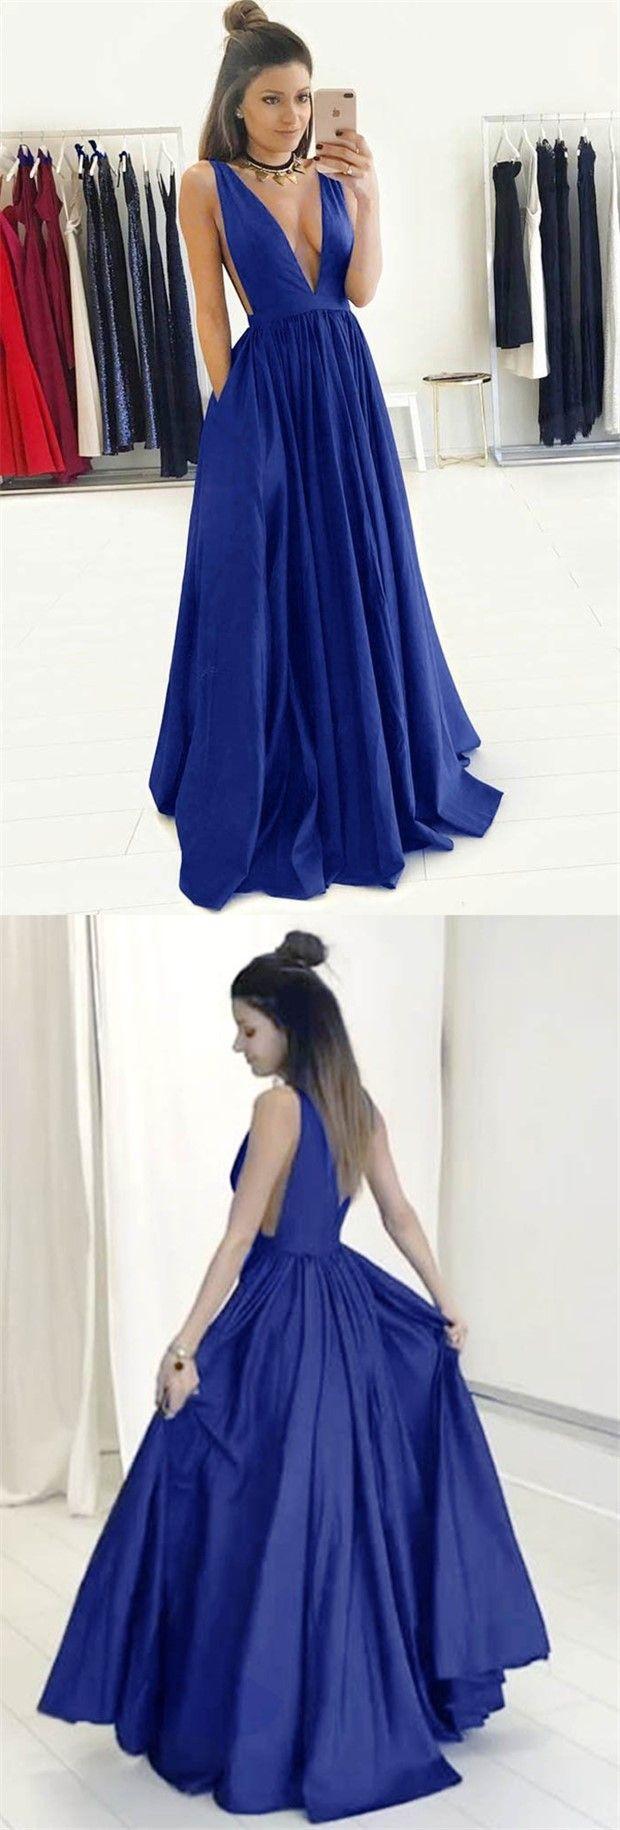 Aline deep vneck sweep train royal blue satin sleeveless prom